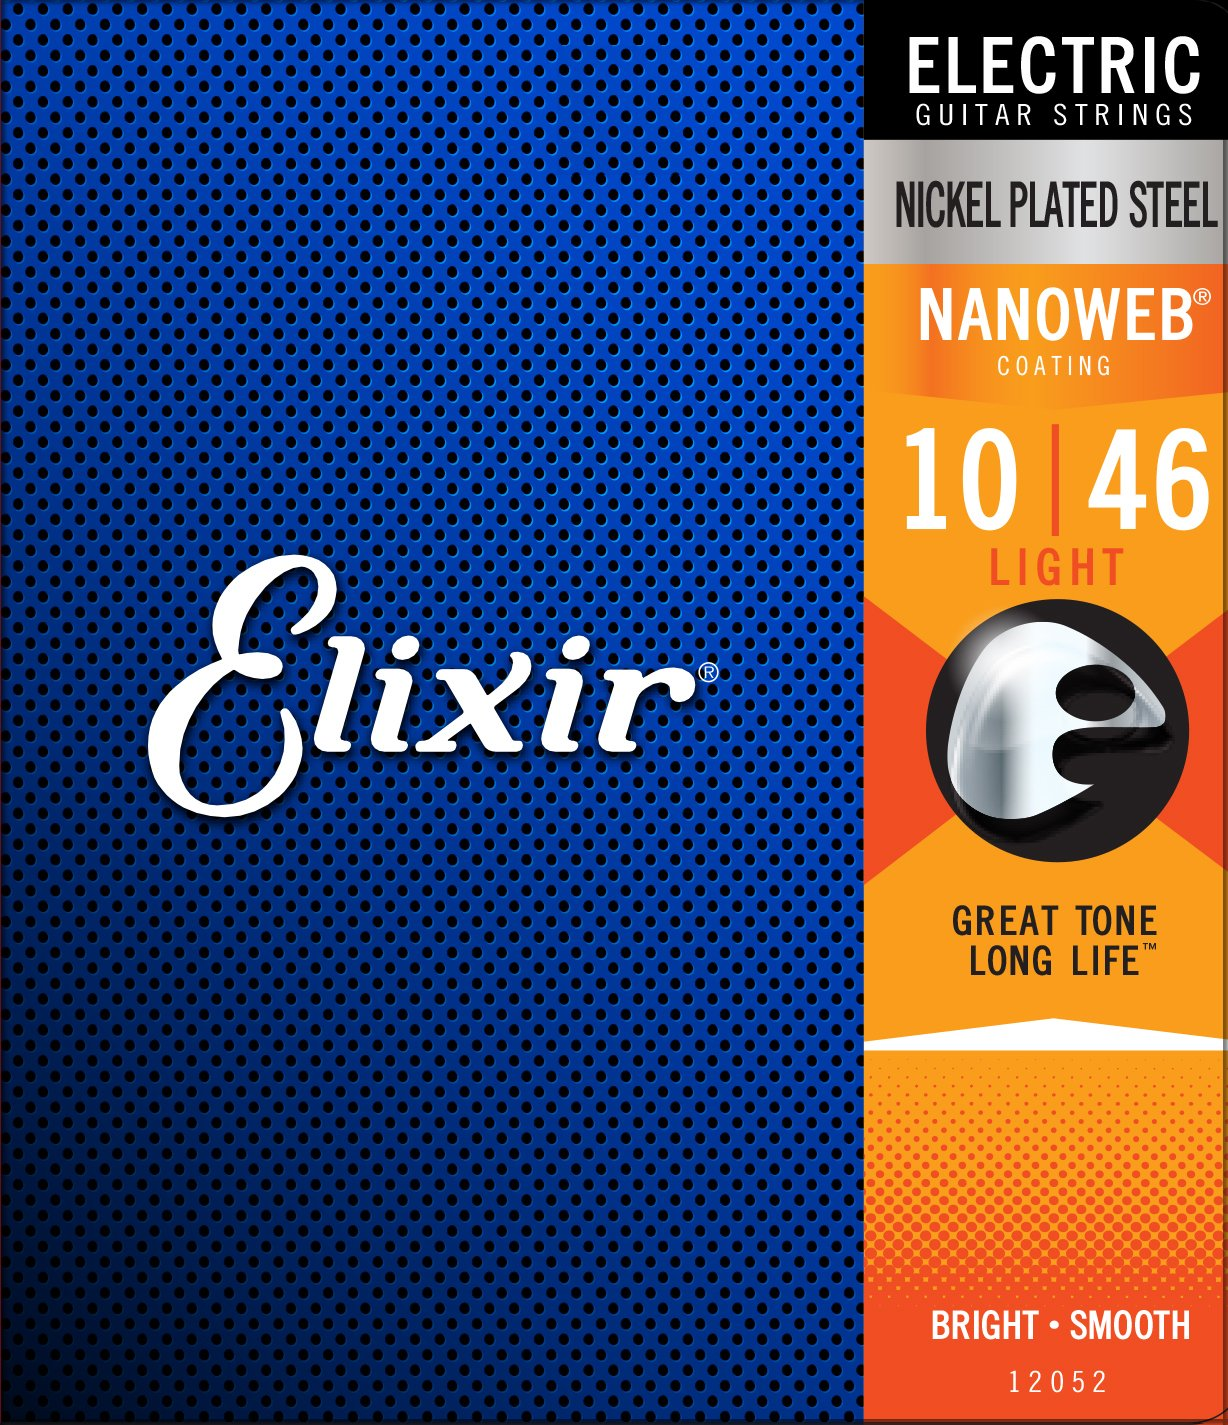 Elixir Nanoweb nickel plate electric 10|46